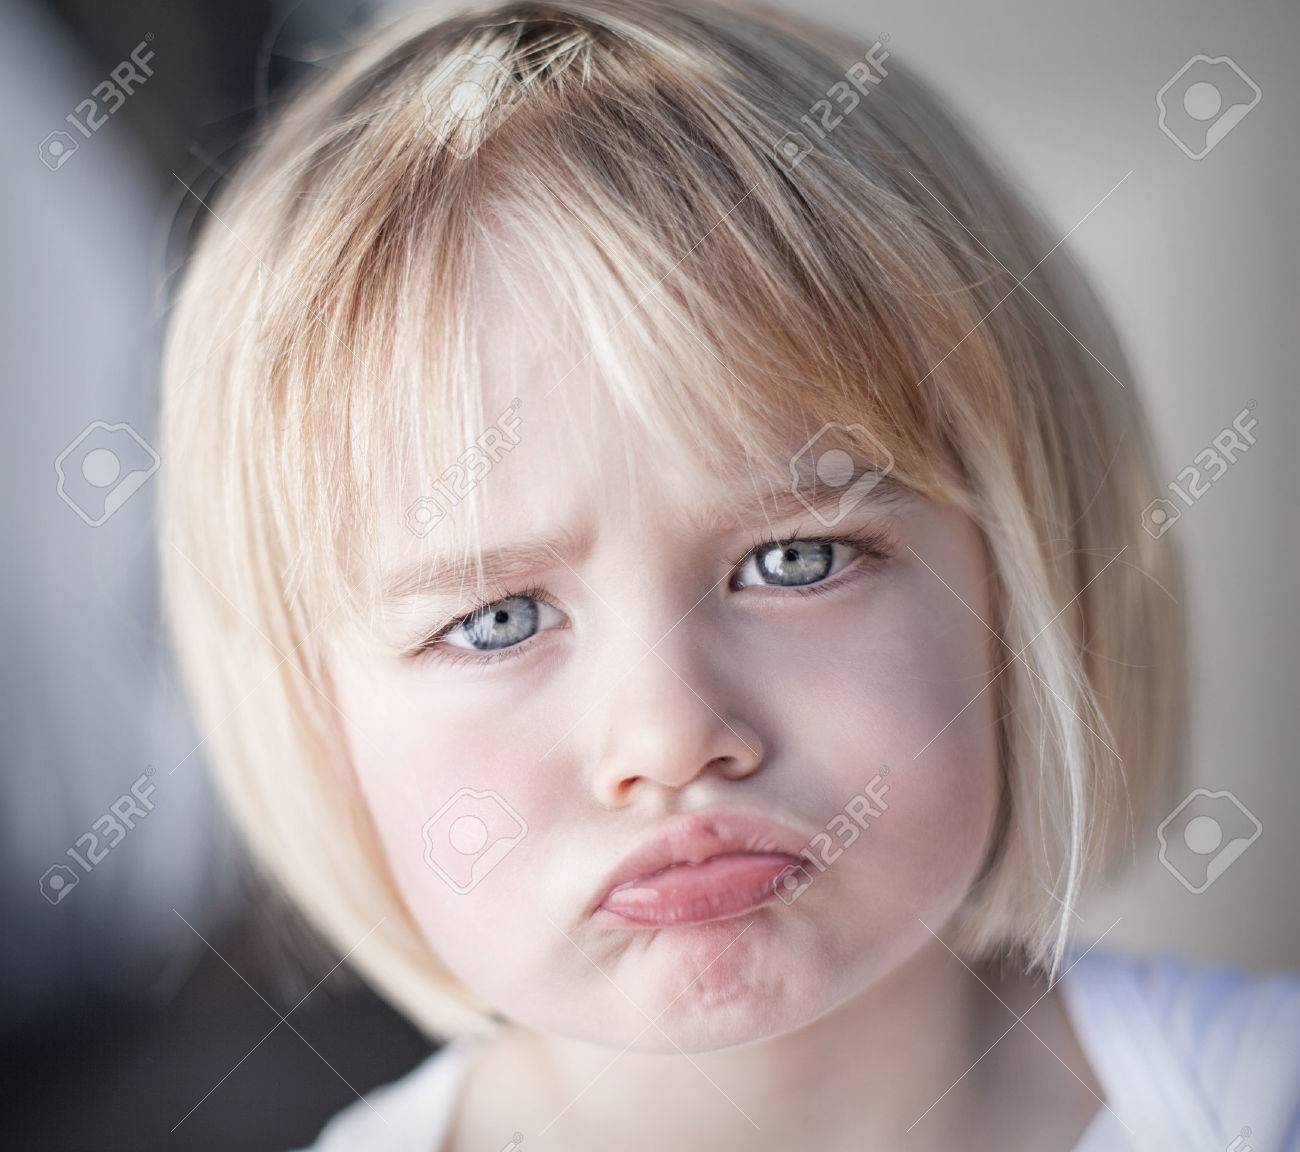 Portrait of lan upset toddler girl - 43179643